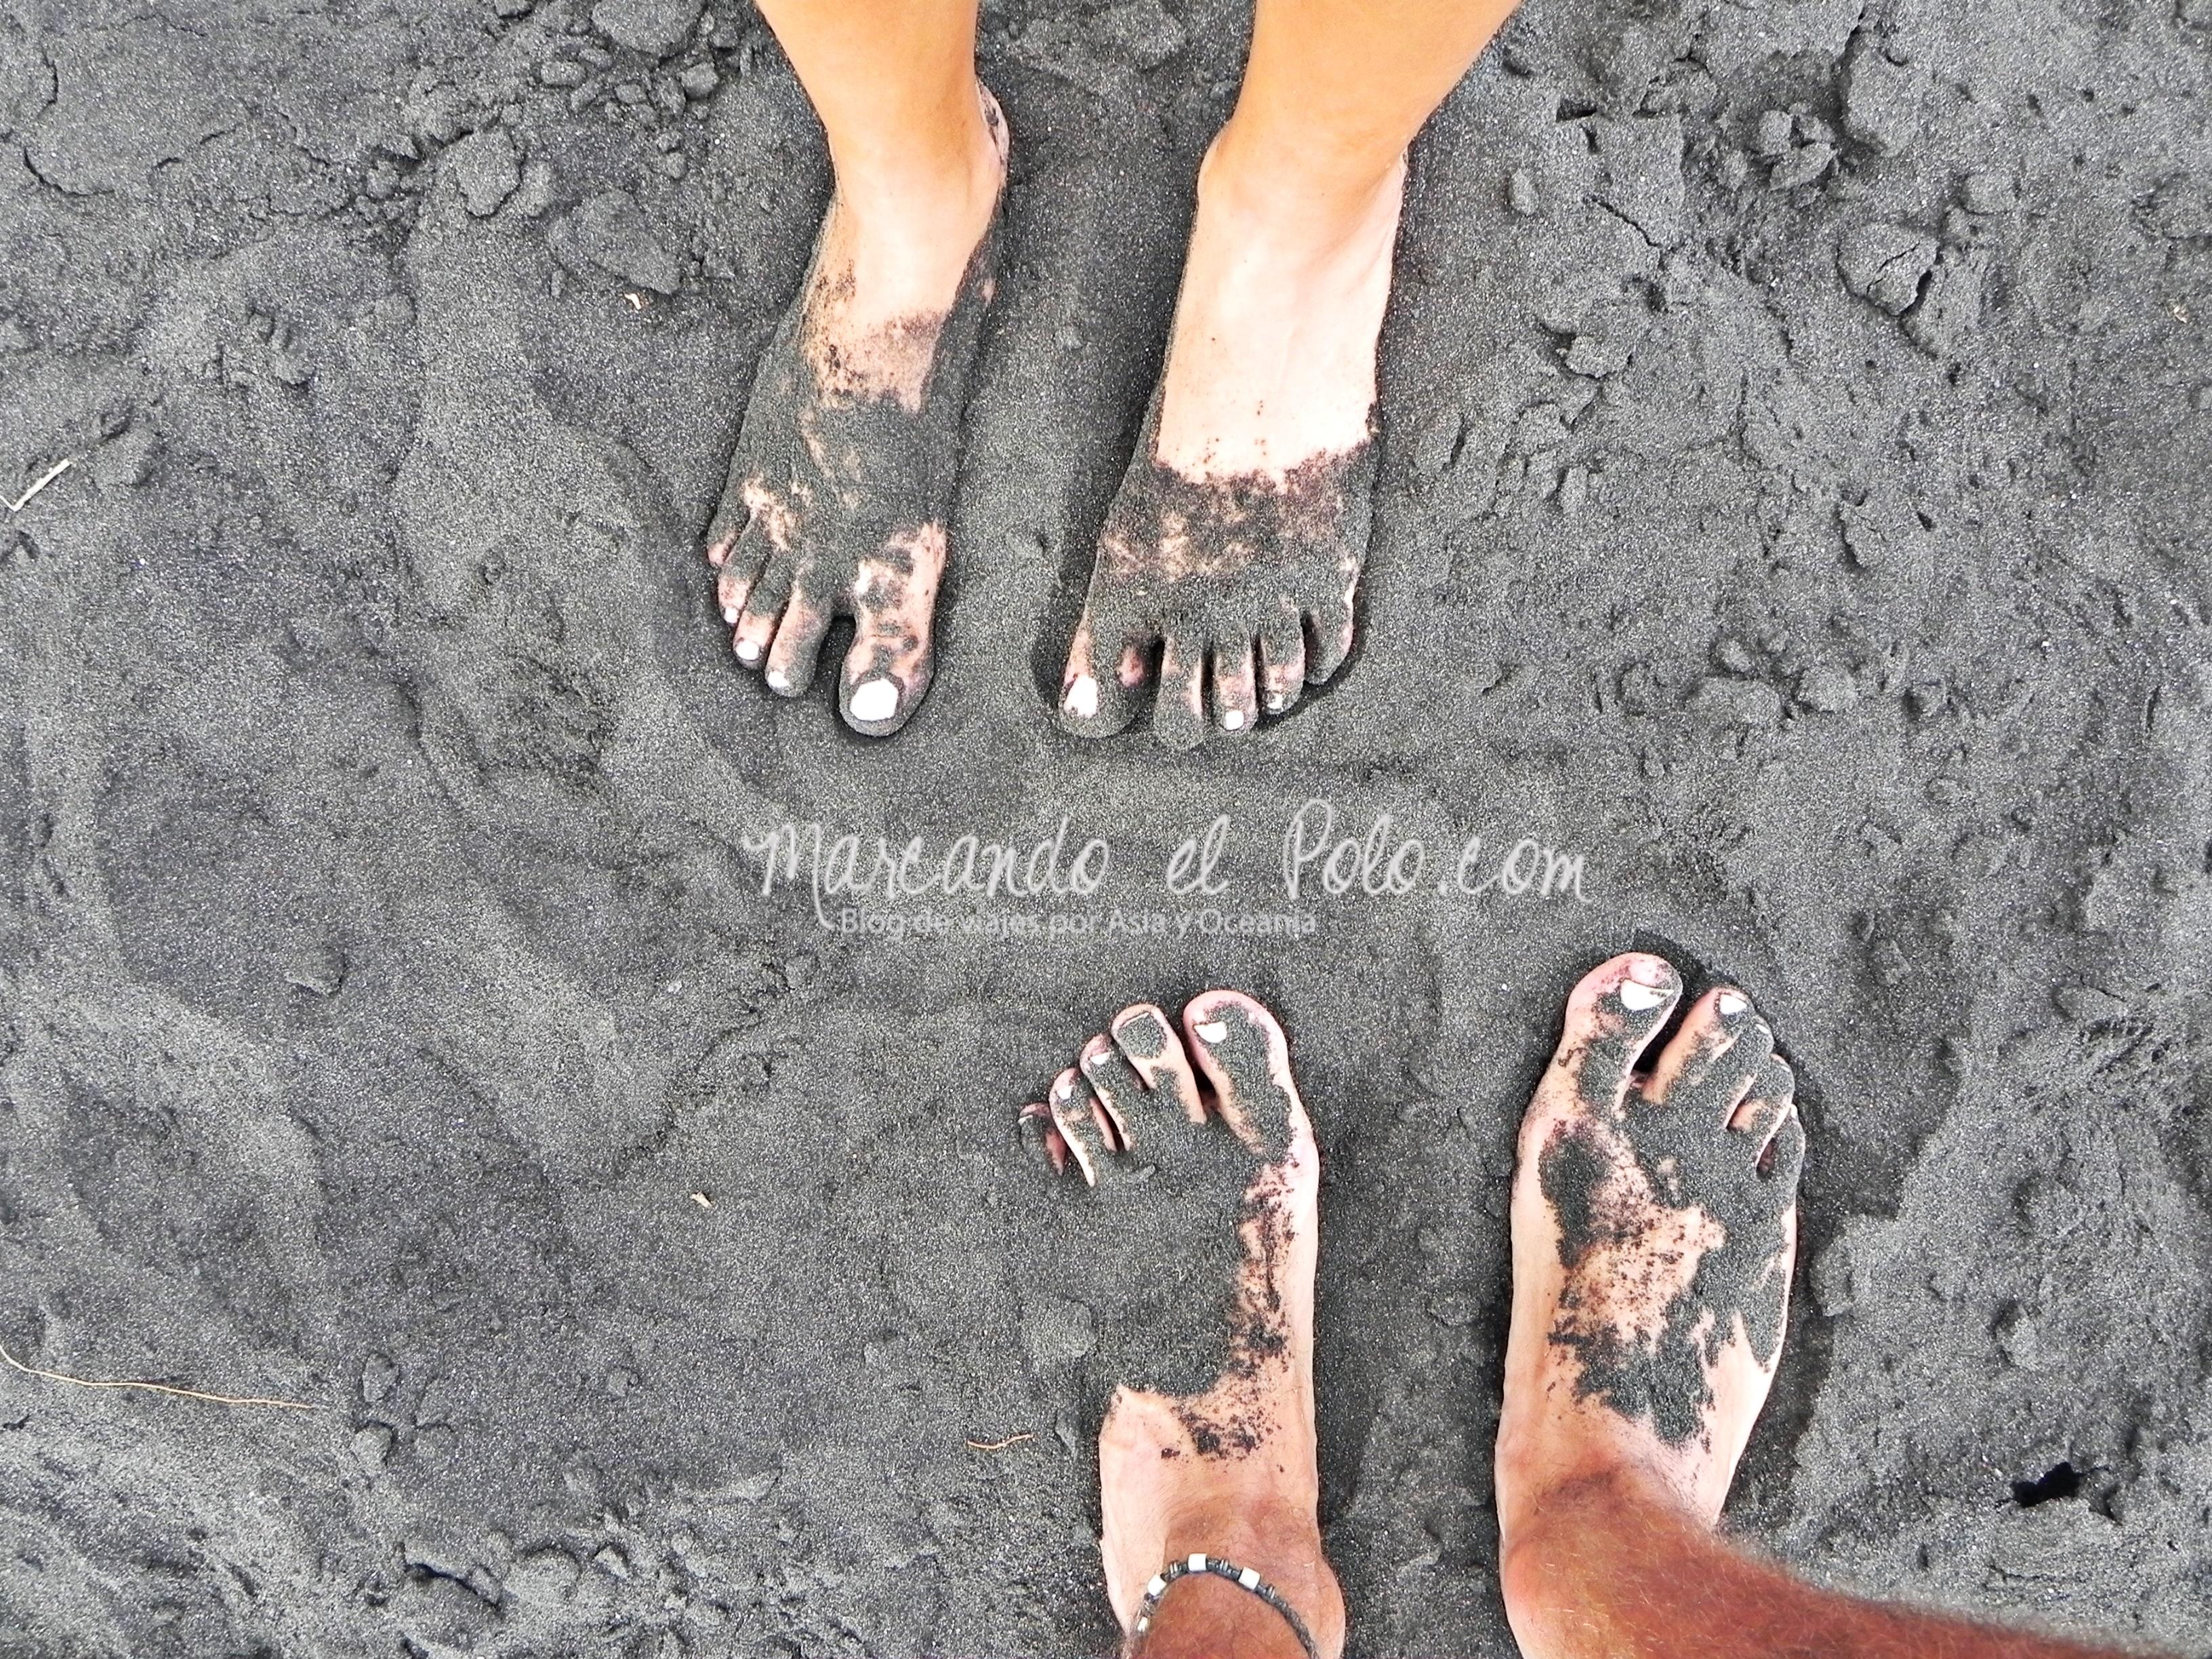 Viajar a Indonesia - Playa arena negra Ende